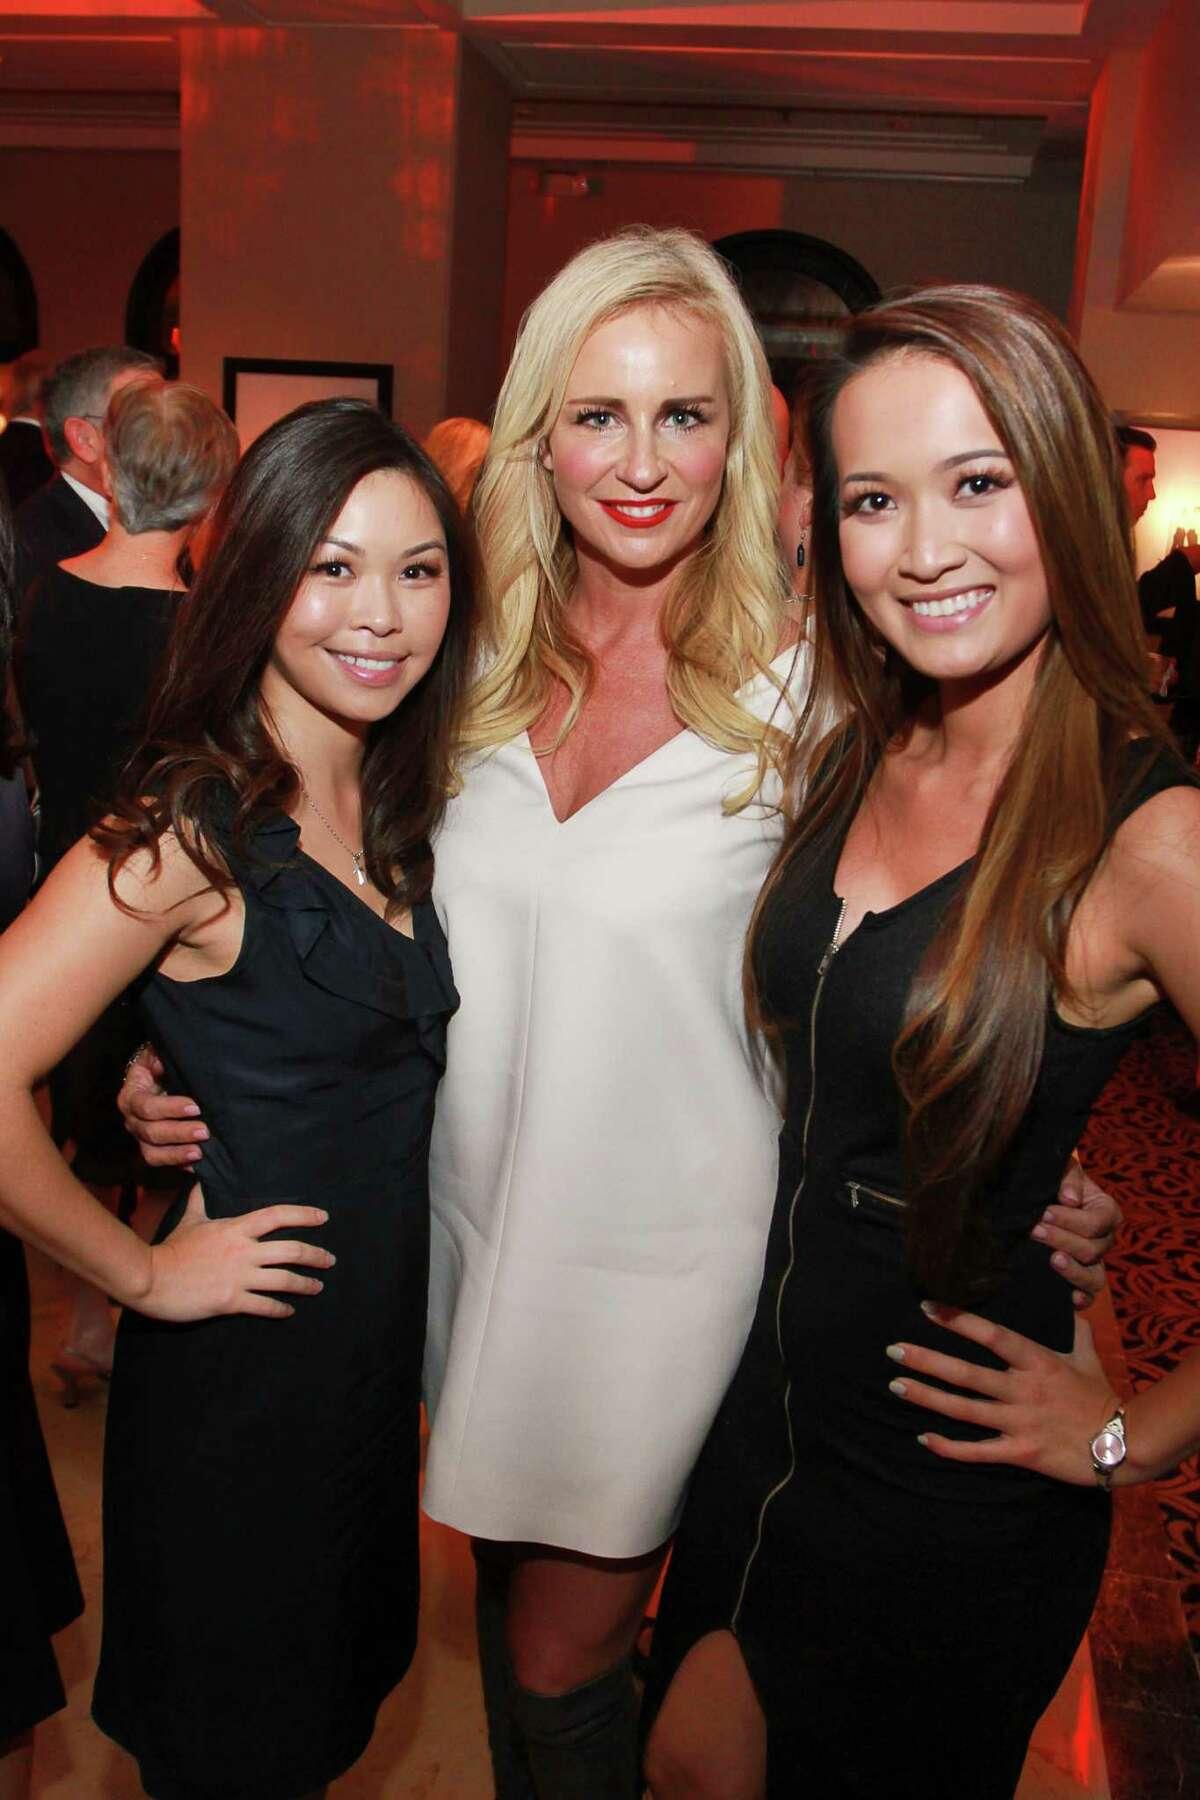 Kim Doan, from left, Lori Ramirez and Ann Vu